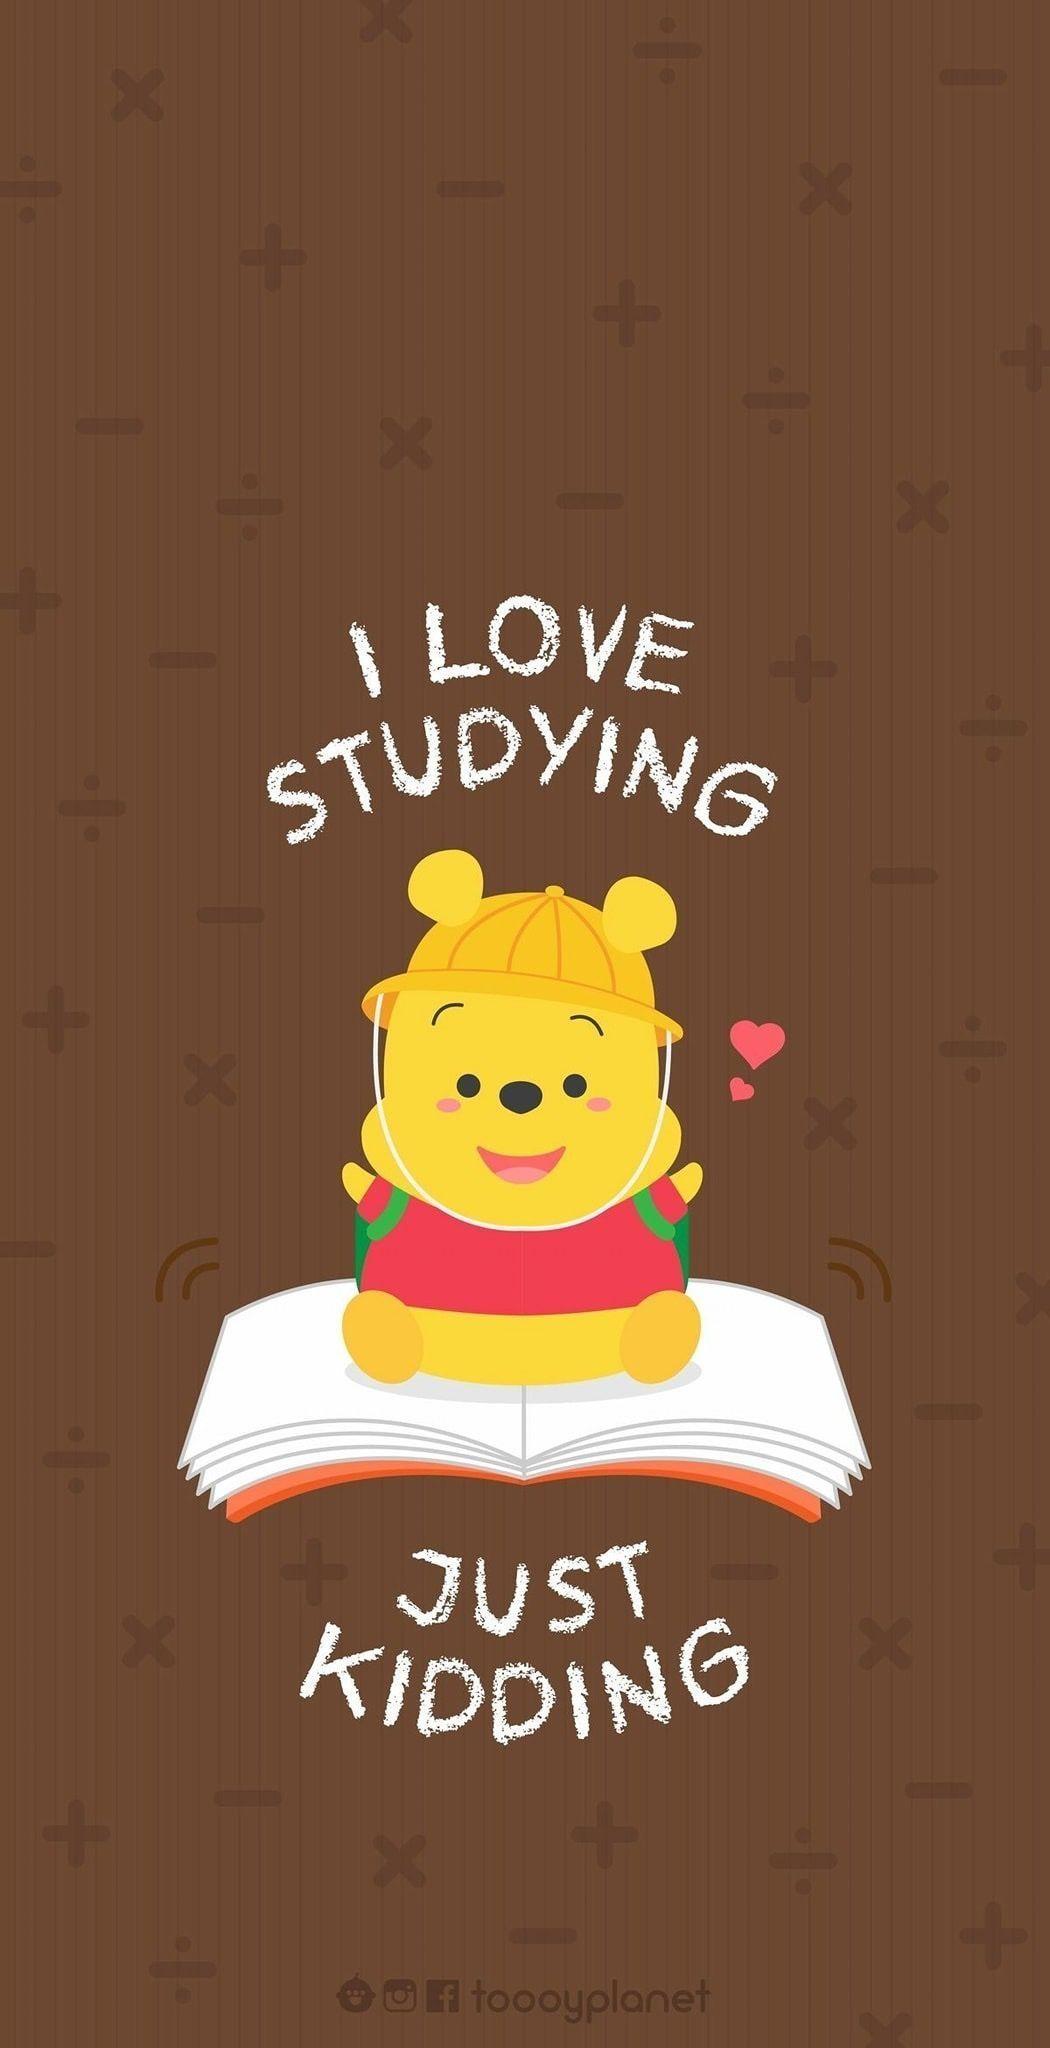 Winnie The Pooh Studying In 2019 Disney Wallpaper Winnie Regarding The Most Cartoon Sardar Disney Wallpaper Cute Winnie The Pooh Disney Cartoons